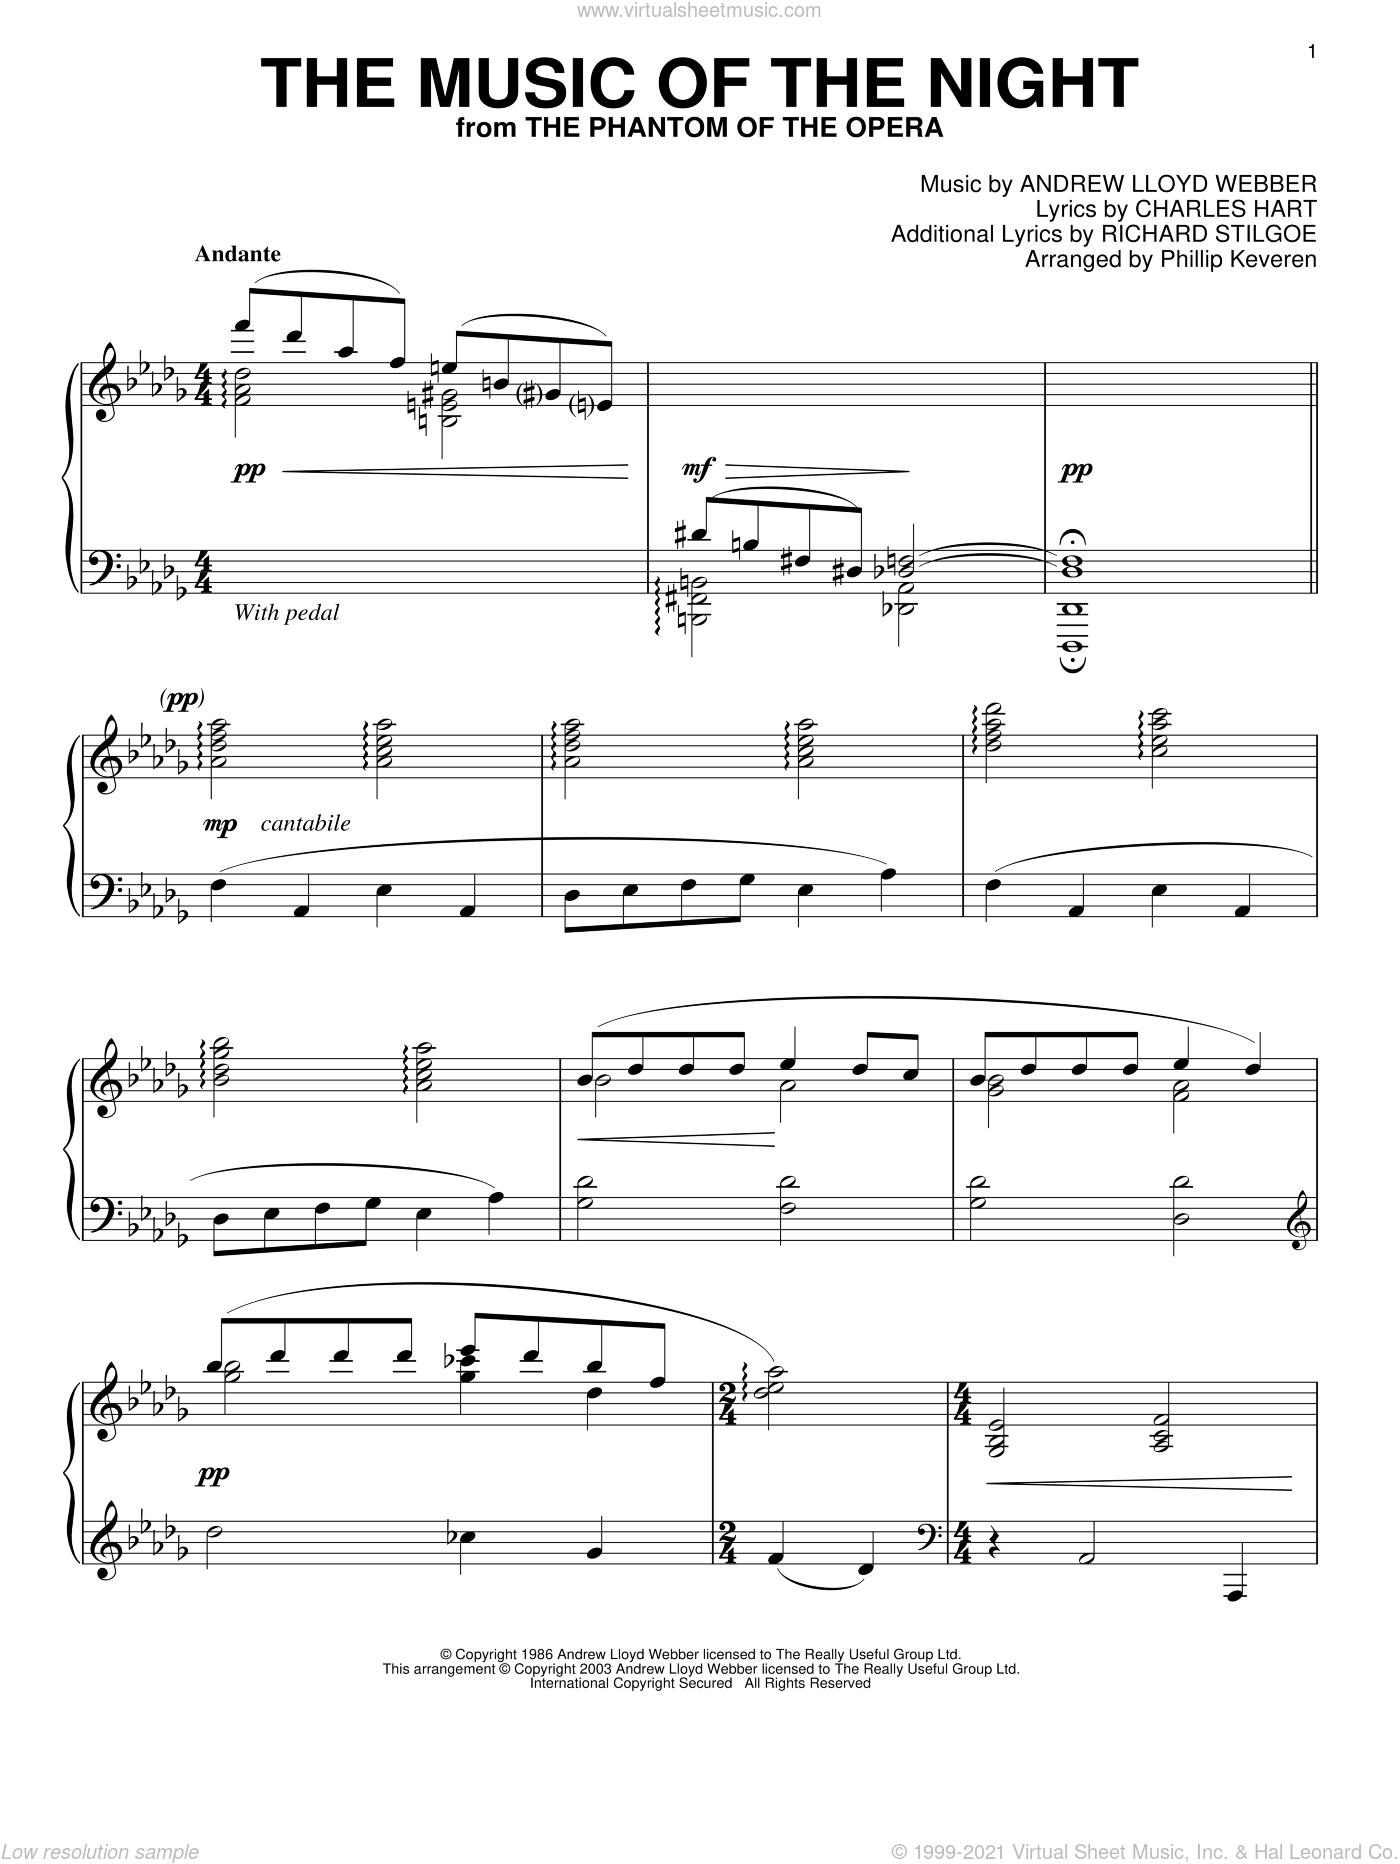 The Music Of The Night (from The Phantom Of The Opera), (intermediate) sheet music for piano solo by Andrew Lloyd Webber, Phillip Keveren, The Phantom Of The Opera (Musical), Charles Hart and Richard Stilgoe, intermediate skill level